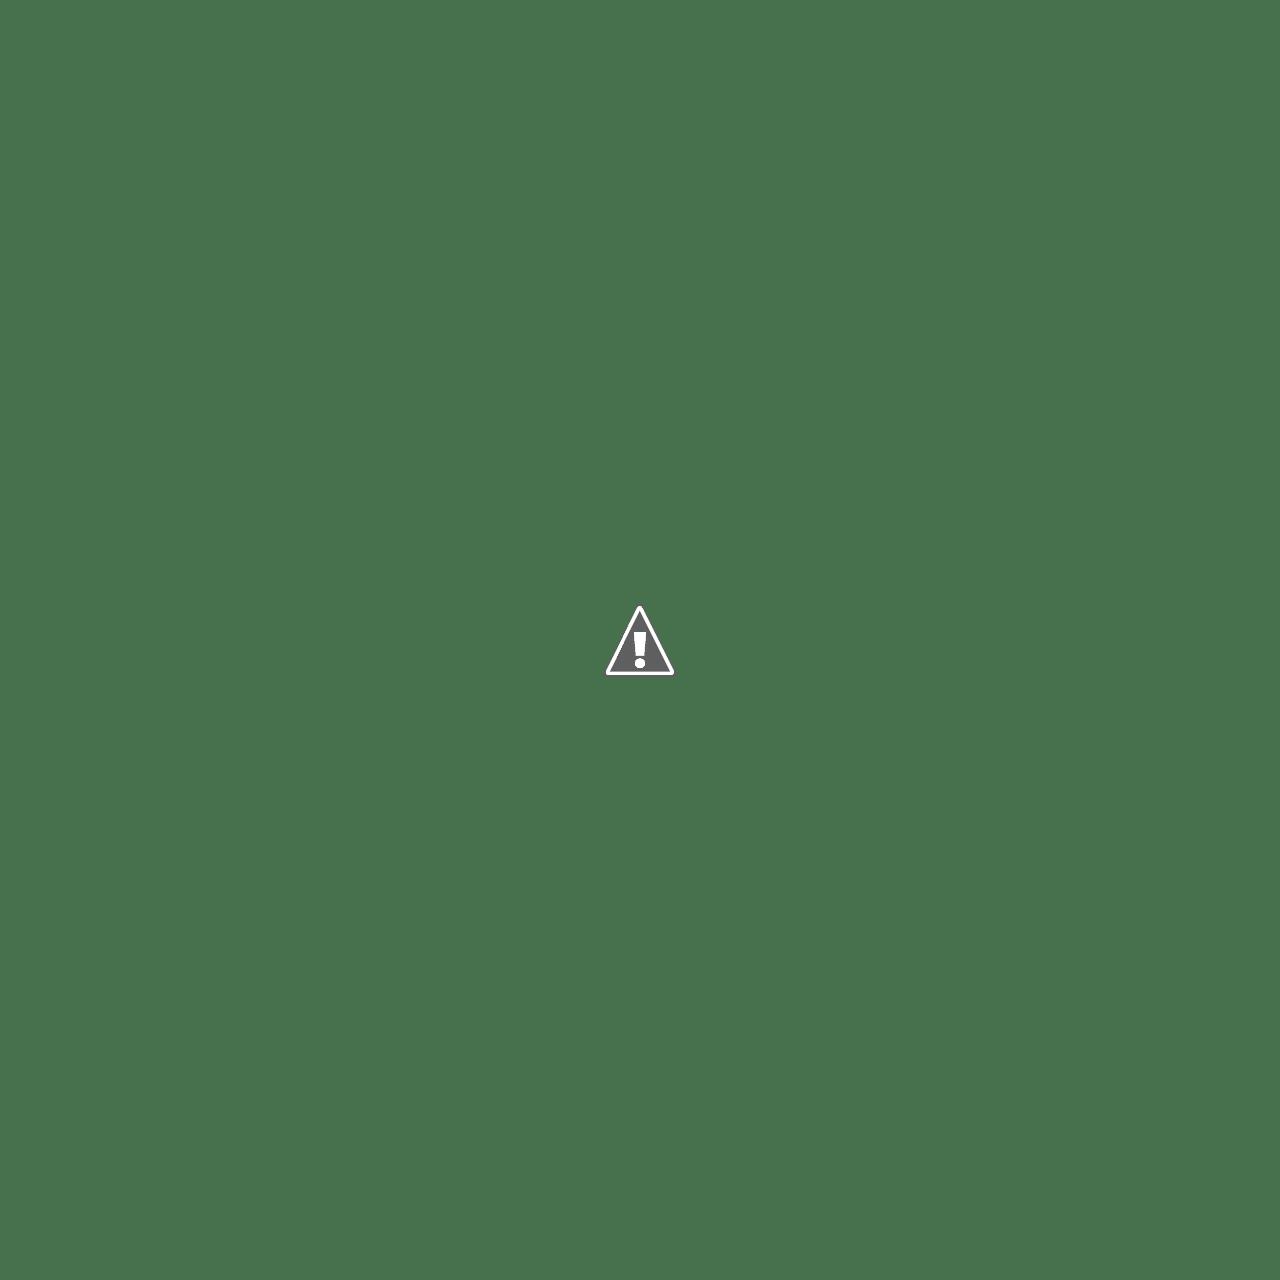 Jireh Car Hire & Travel Namibia - Car Rental Agency in